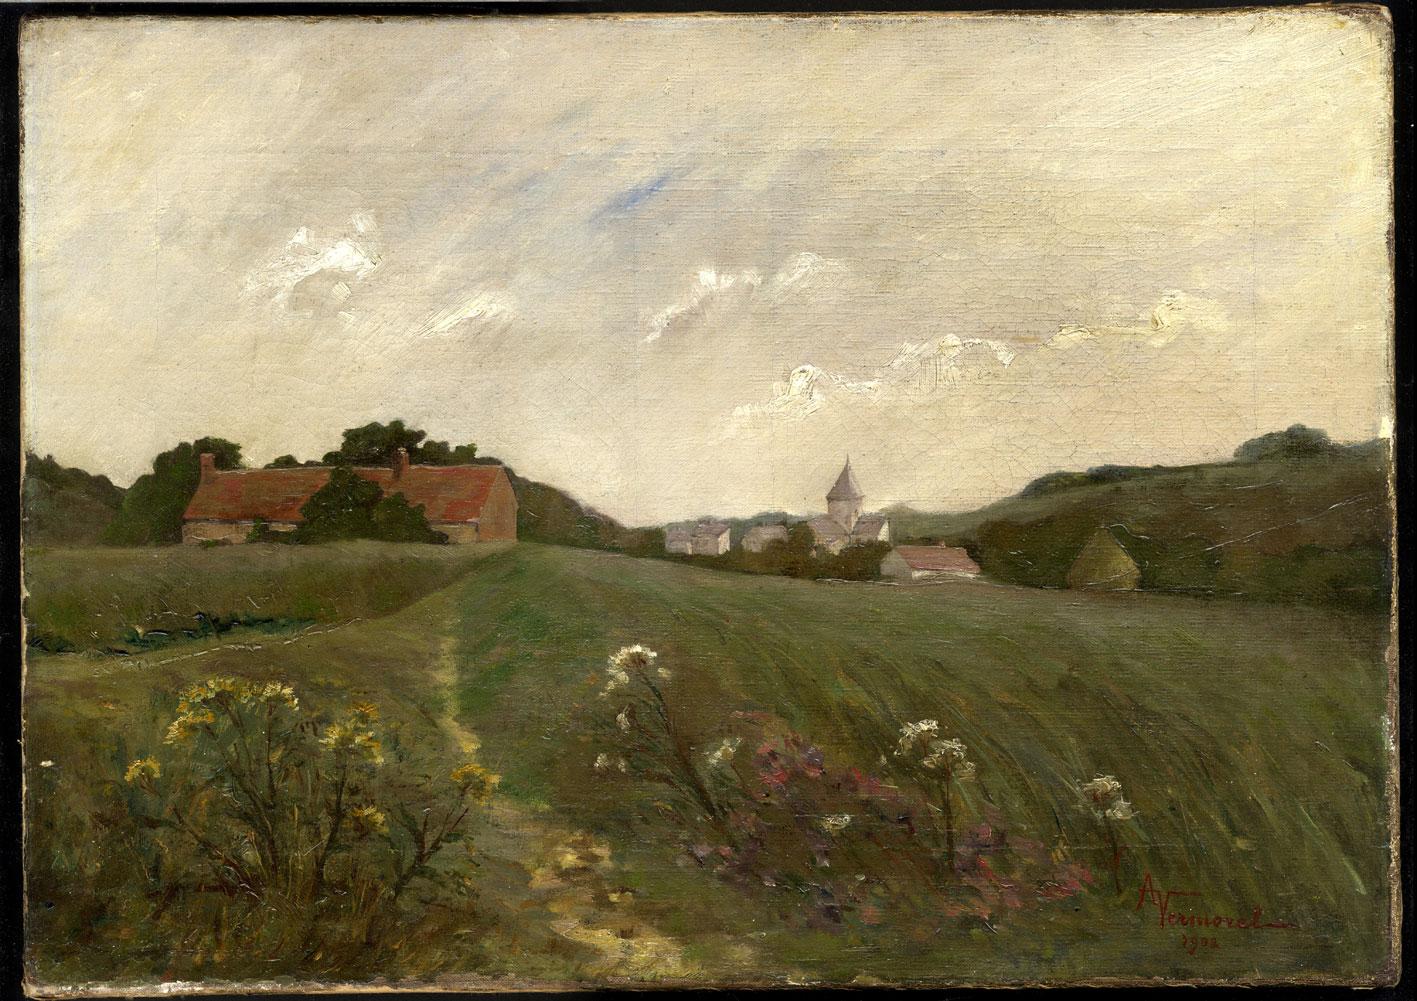 Charles Daubigny Barbizon Foret Barque le Botin Zig Zag bords de l Oise Auvers Camille Corot Gustave Courbet